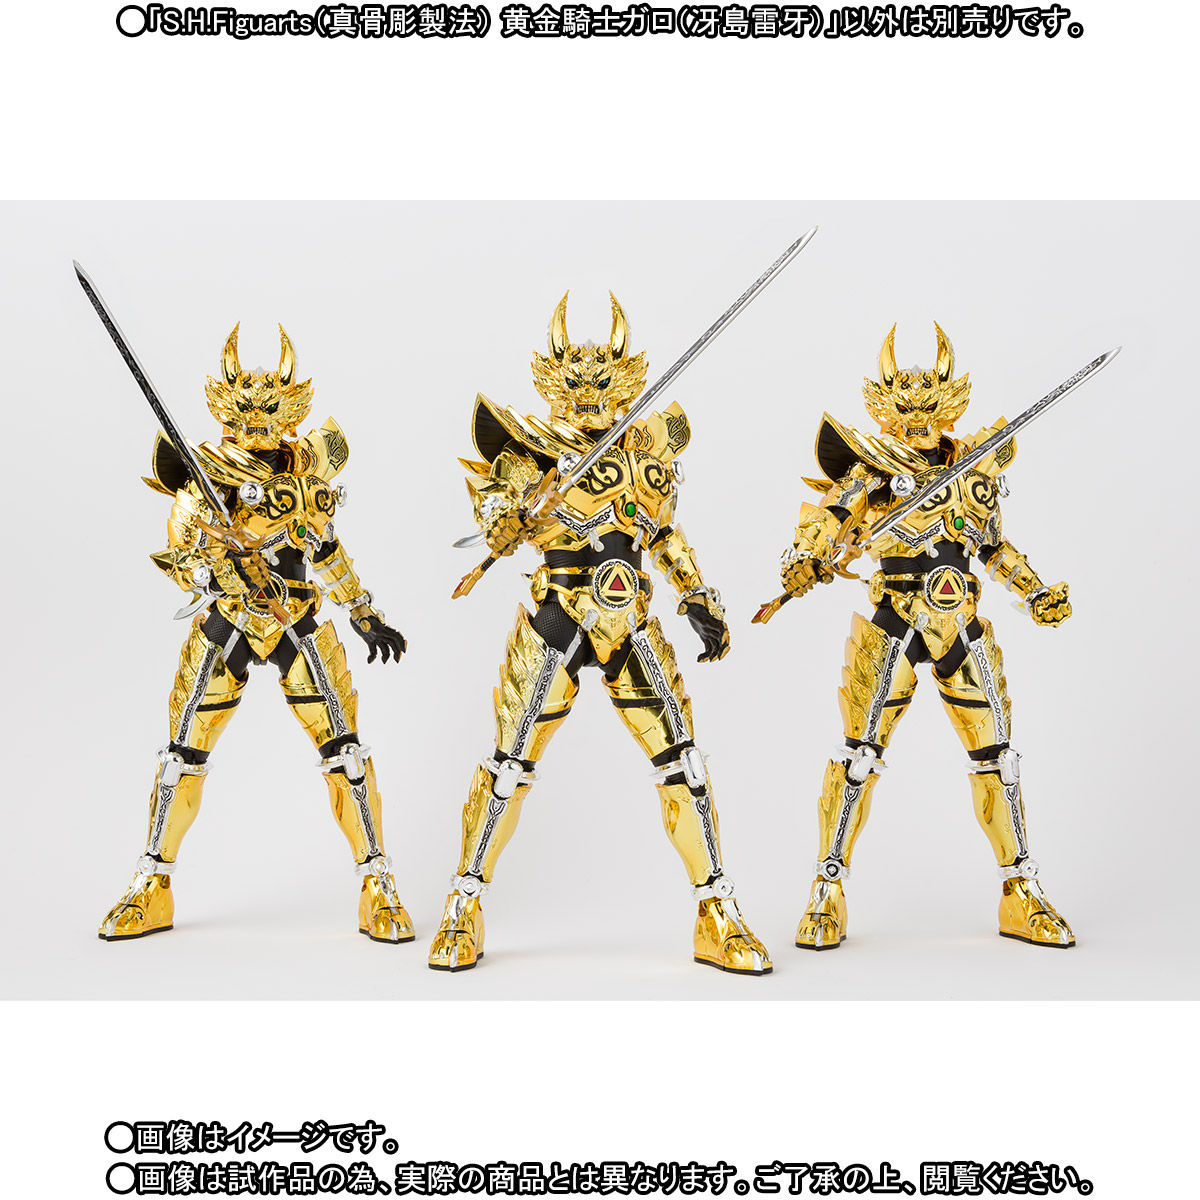 S.H.フィギュアーツ(真骨彫製法)『黄金騎士ガロ(冴島雷牙)』牙狼〈GARO〉可動フィギュア-009